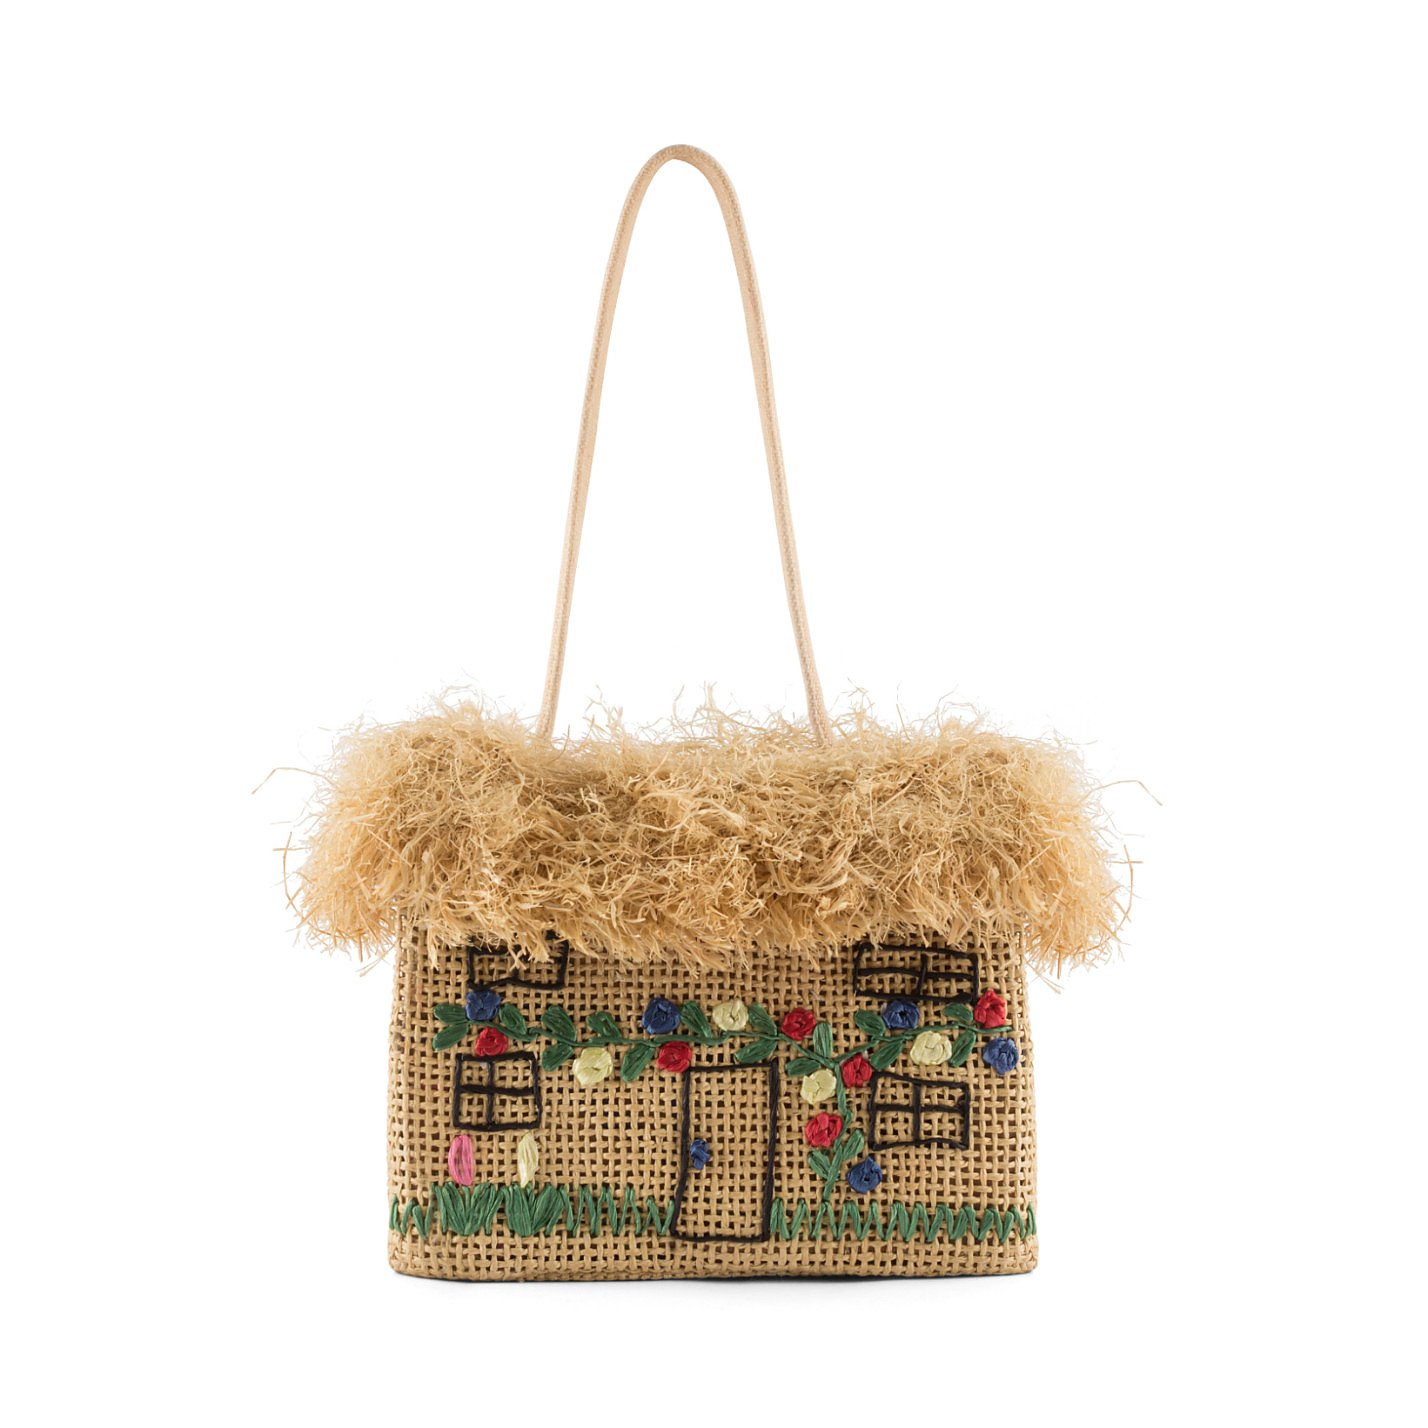 Lulu Guinness Straw House Bag